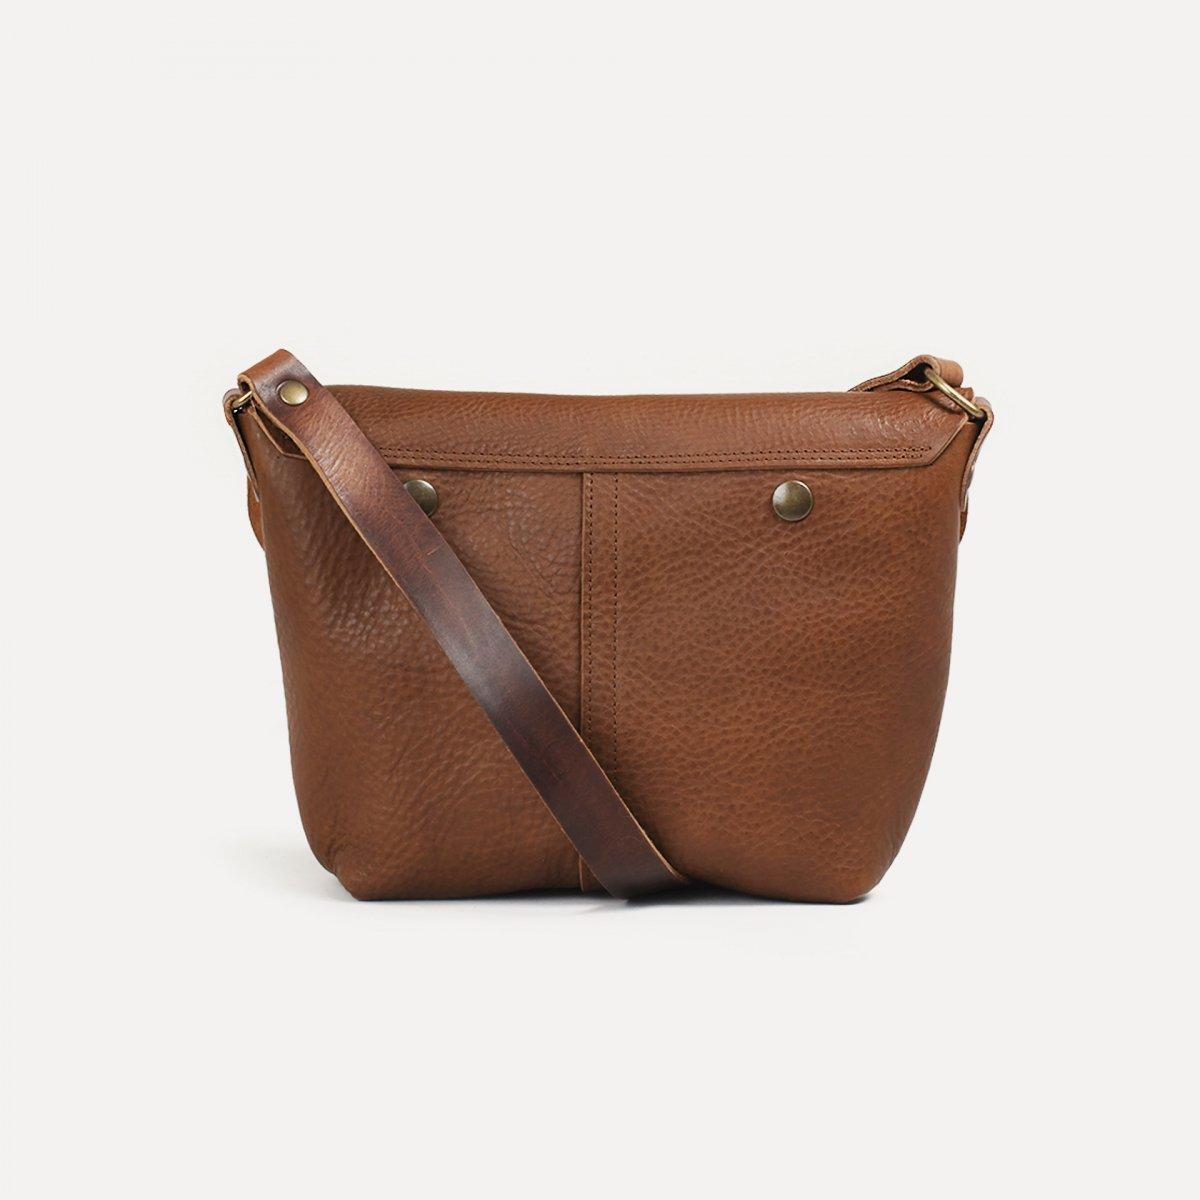 Louis Satchel bag - Cuba Libre (image n°3)